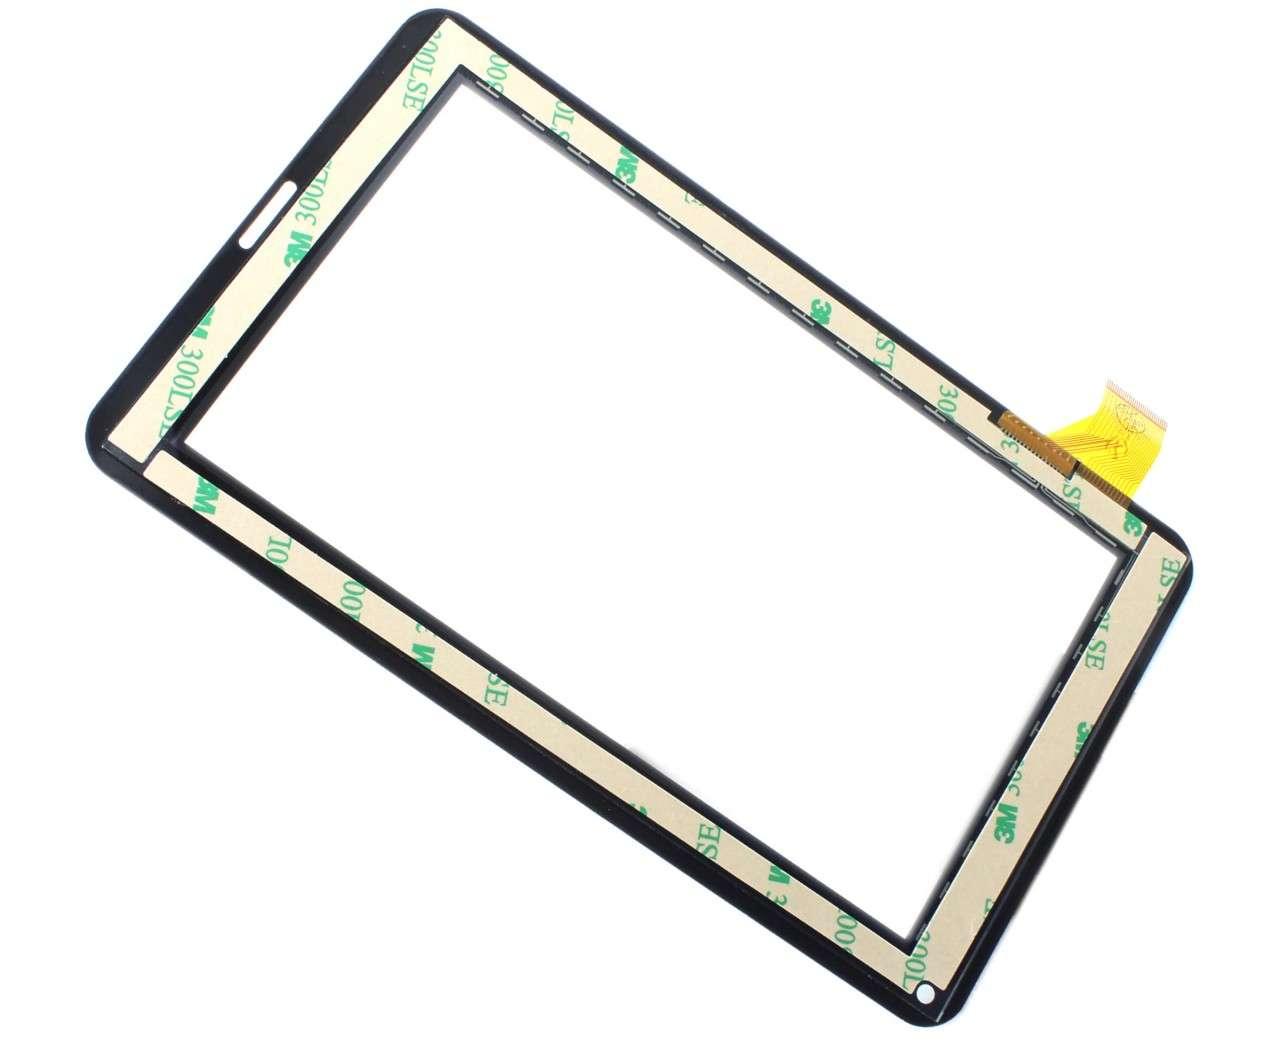 Touchscreen Digitizer Best Buy Easy Home 7 Geam Sticla Tableta imagine powerlaptop.ro 2021